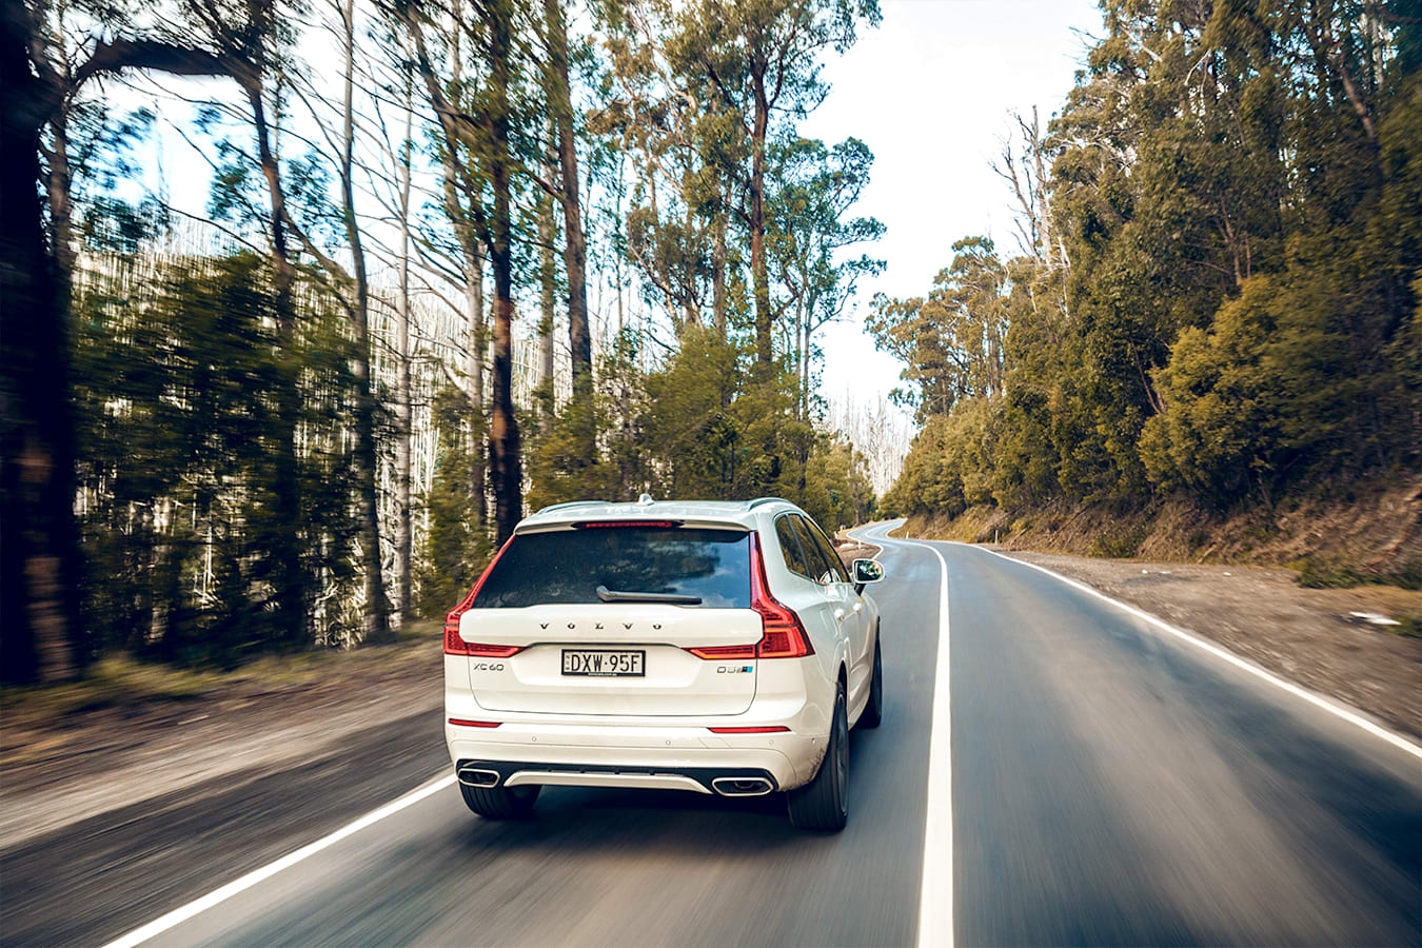 Volvo Xc 60 Rear Roll Jpg